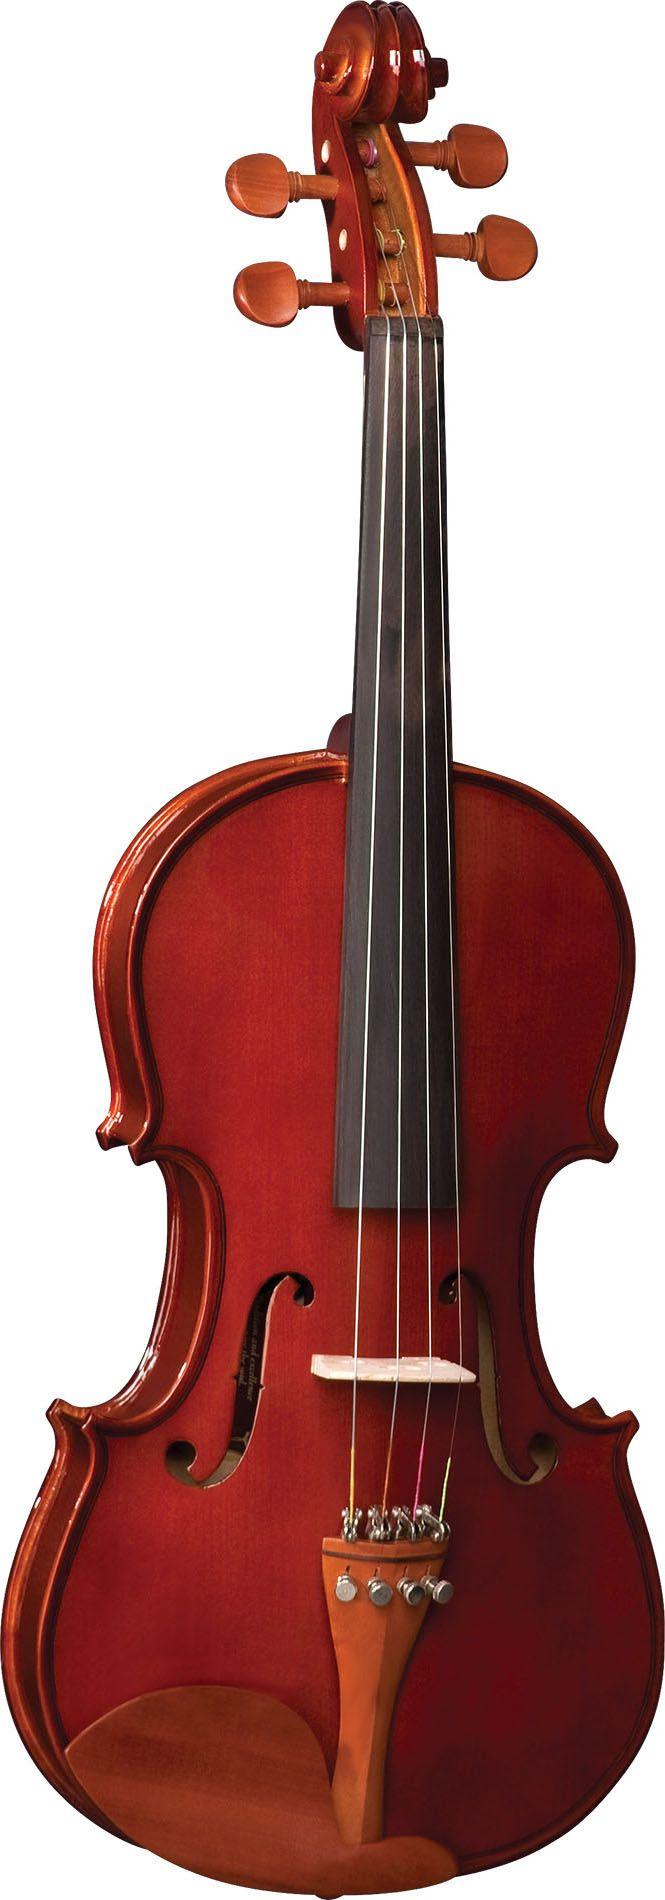 Violino EAGLE 4/4 Classic Series VE441 Envernizado